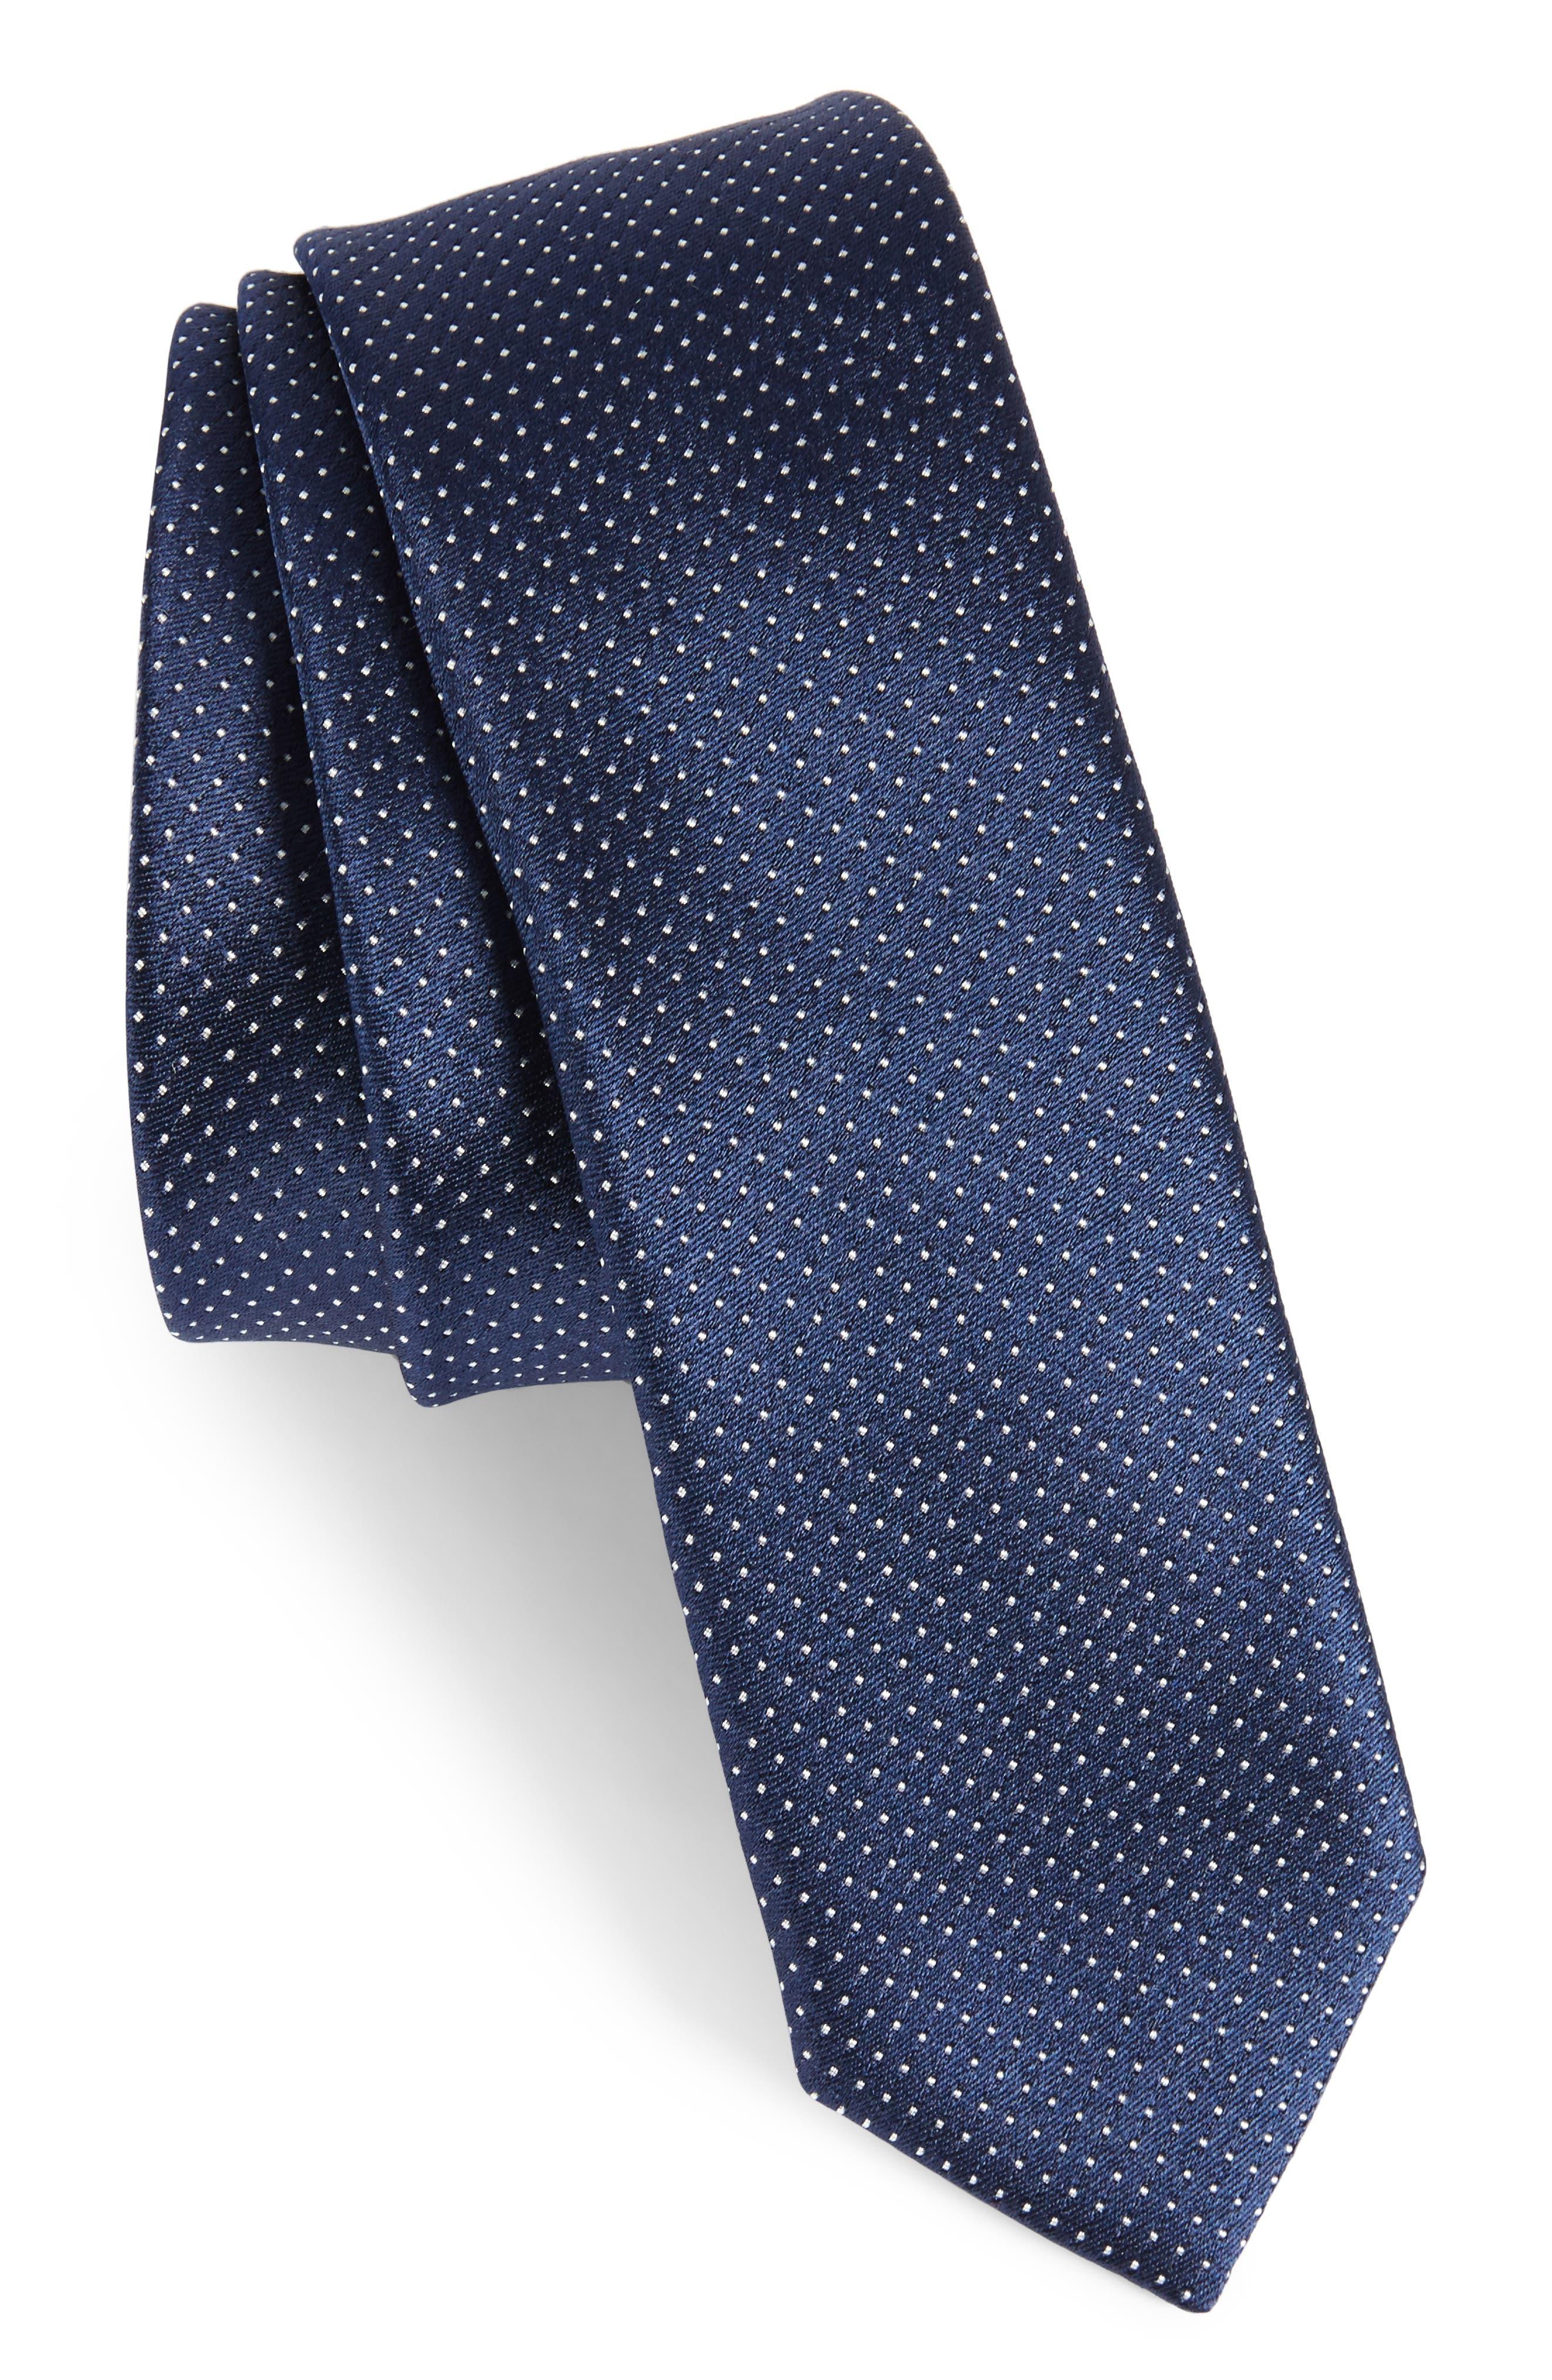 Dot Silk Skinny Tie,                             Main thumbnail 1, color,                             410